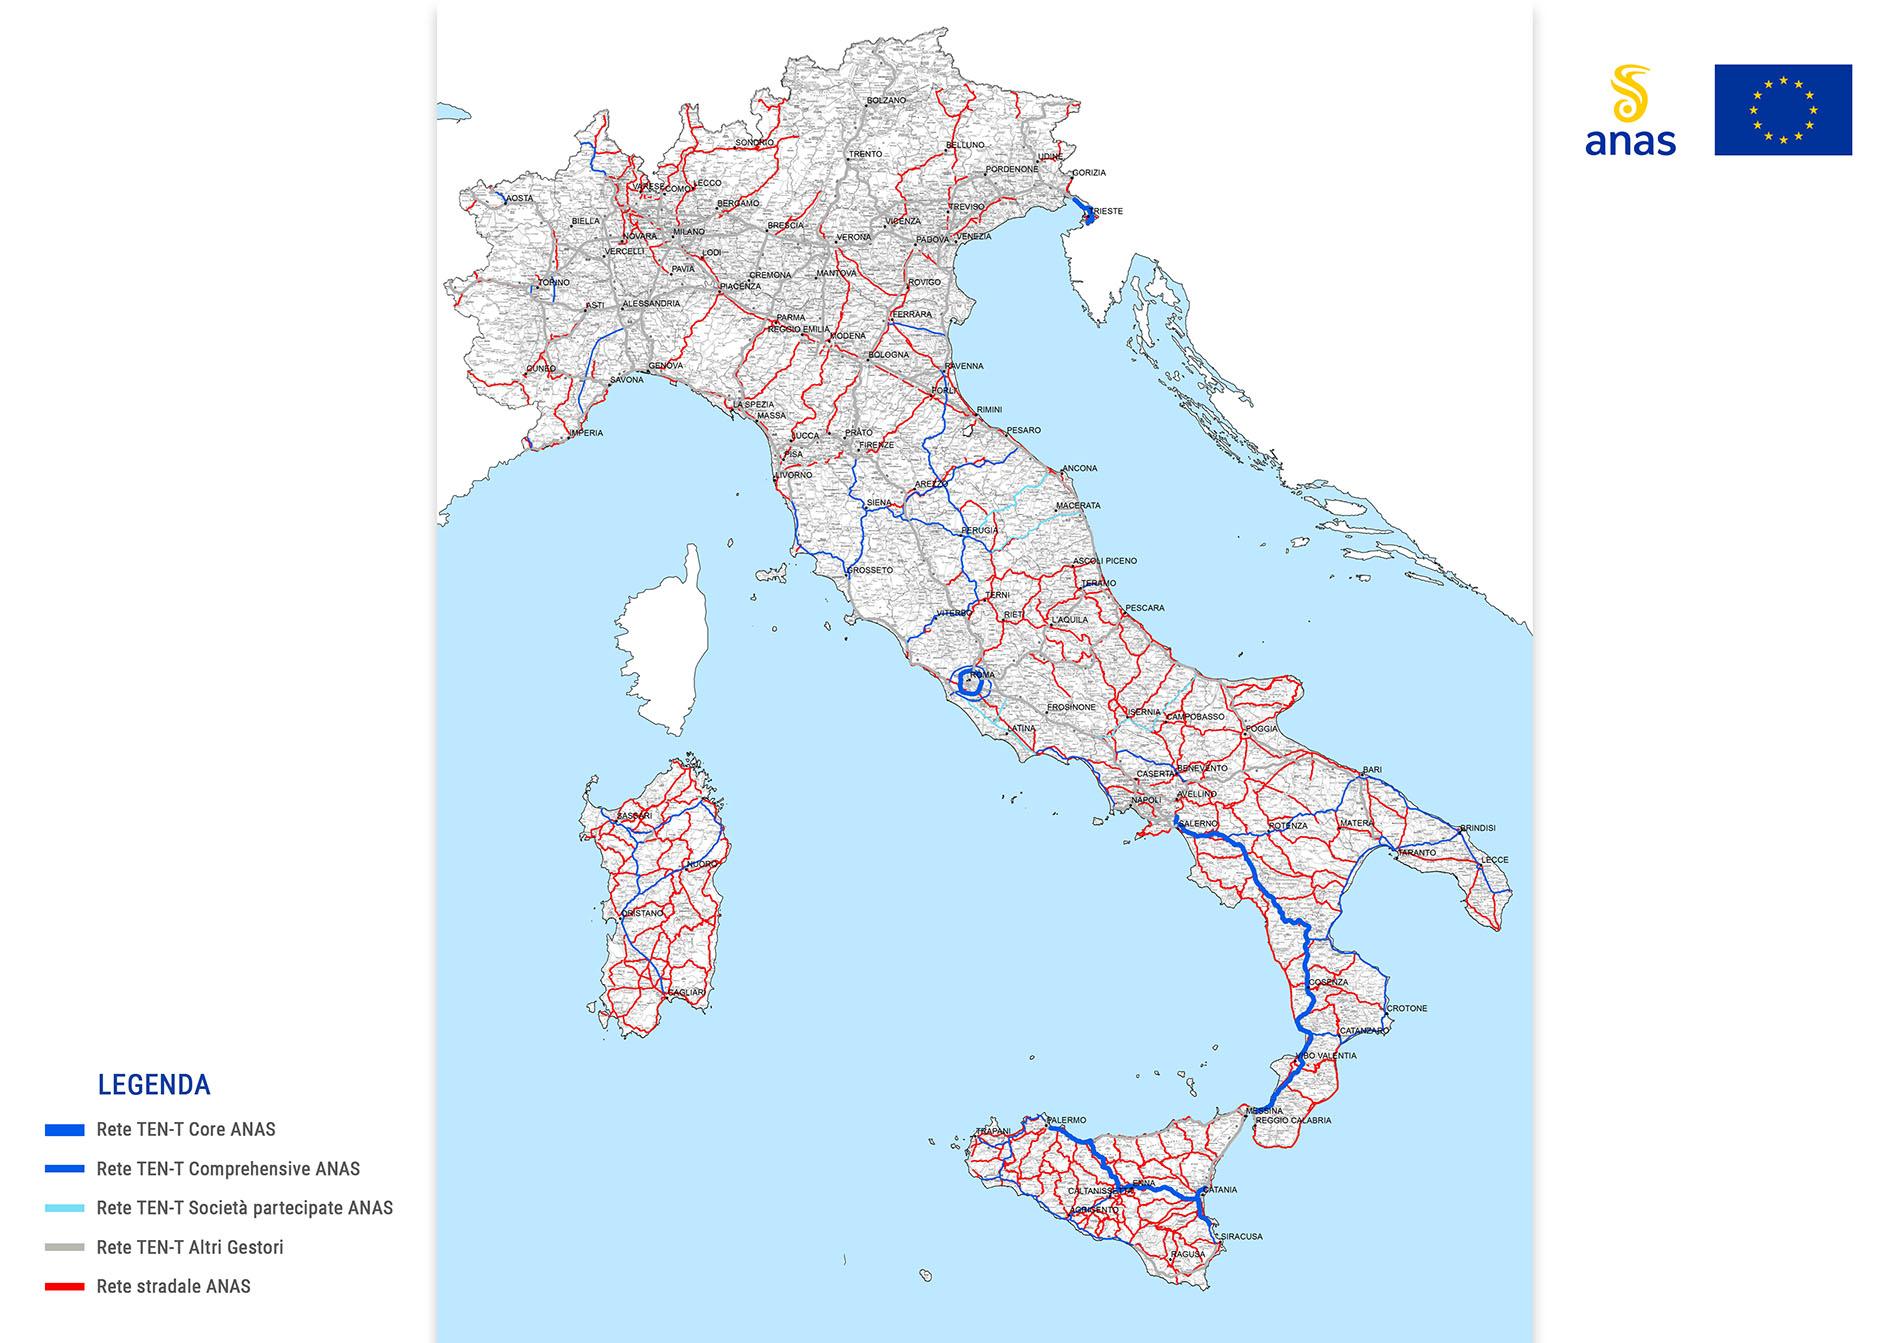 Mappa-2-Rete-Ten-T-Anas